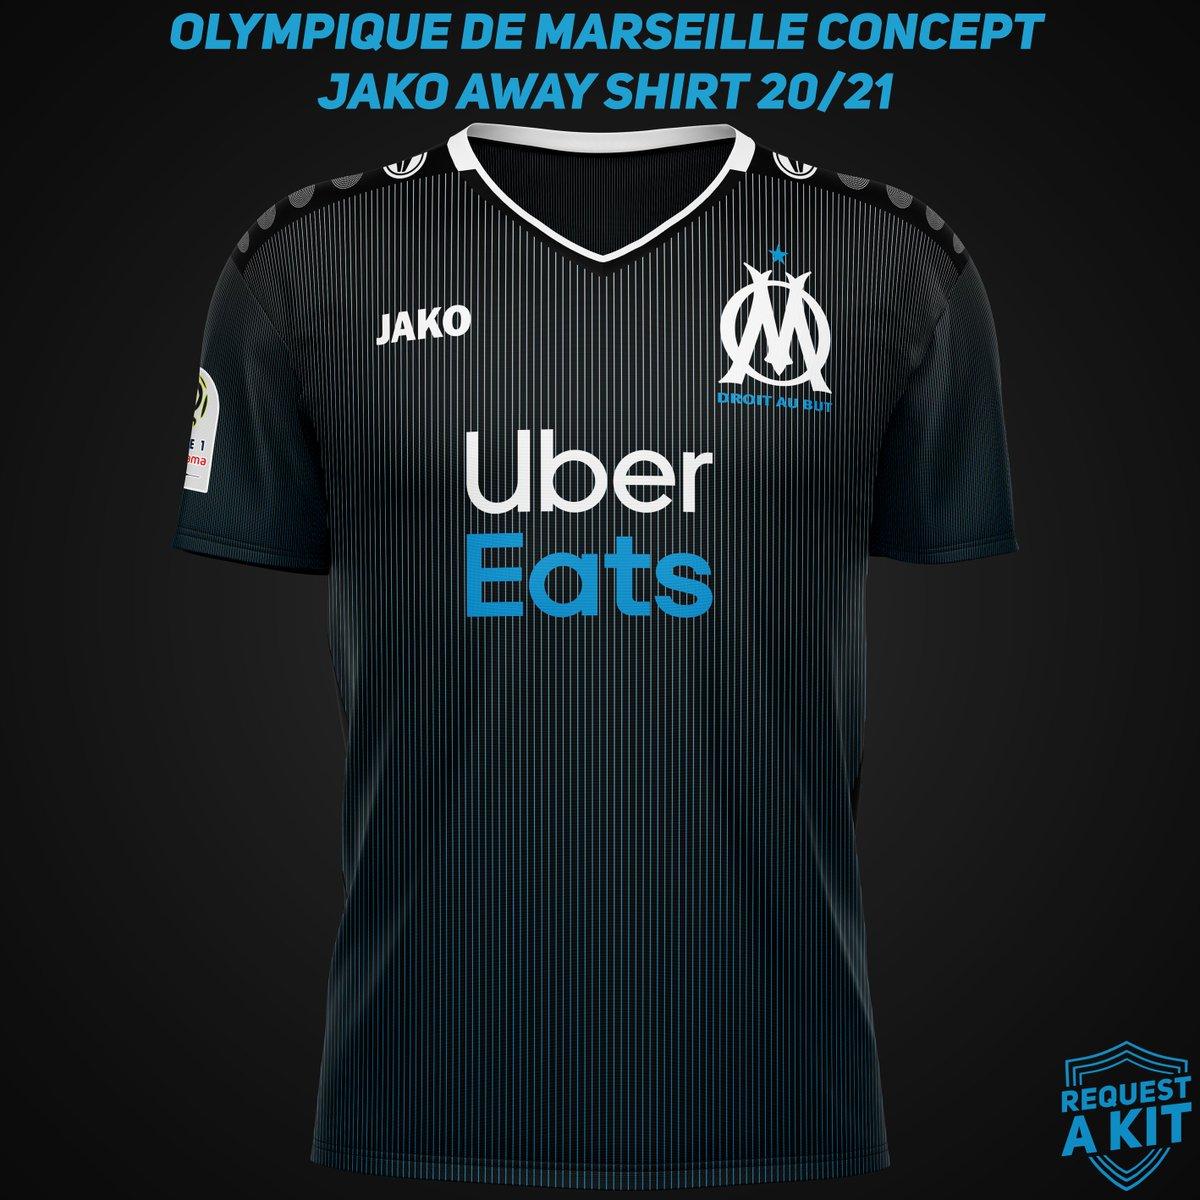 Request A Kit On Twitter Olympique De Marseille Concept Jako